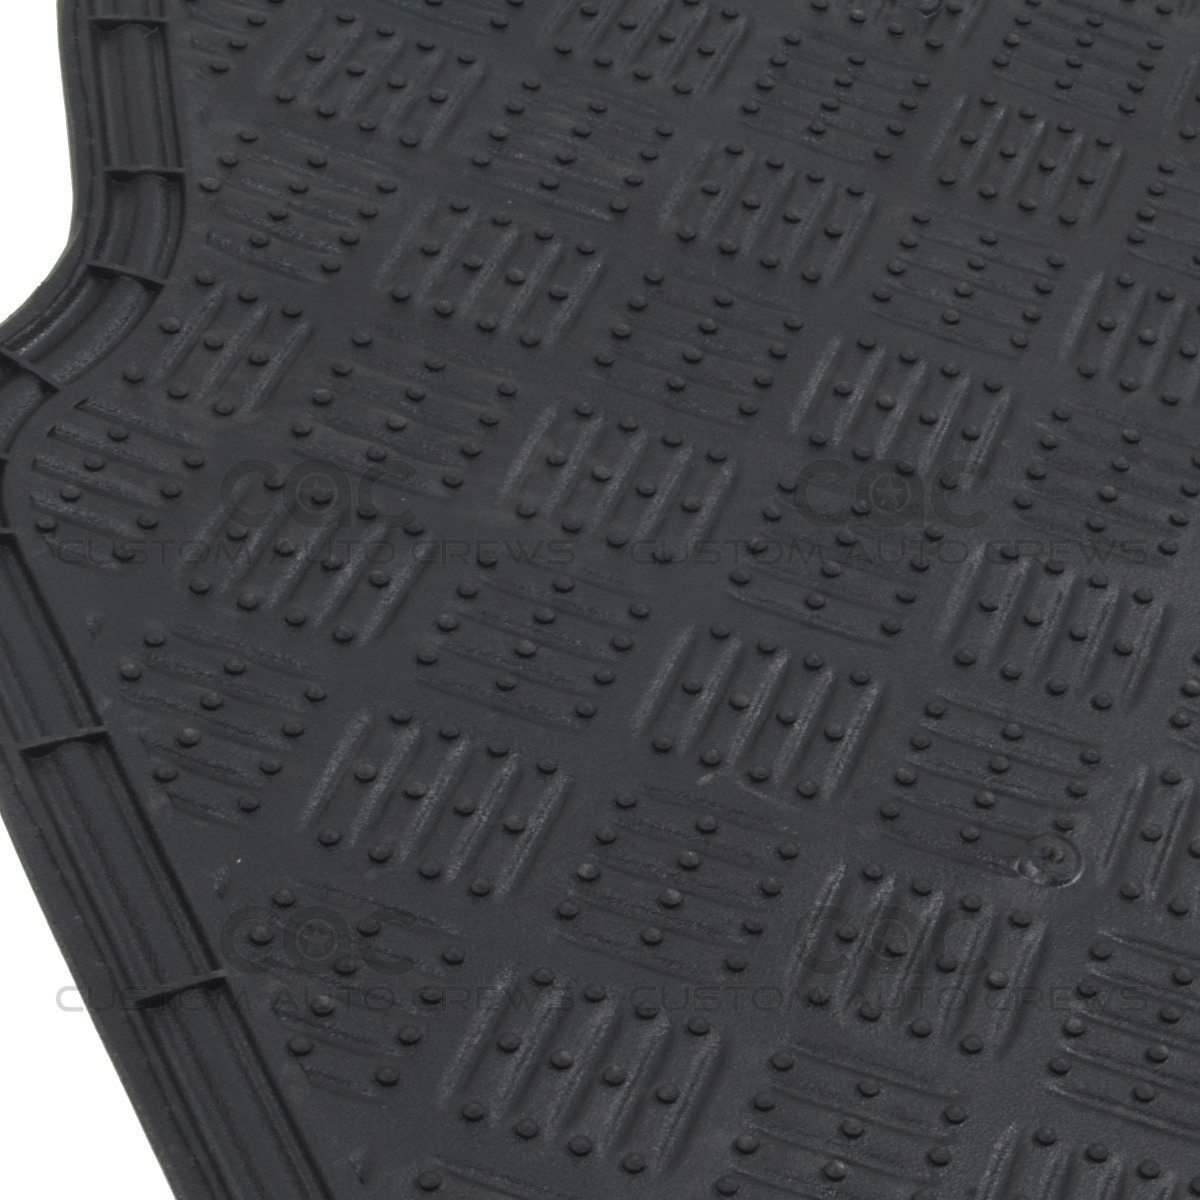 Rubber floor mats singapore - Heavy Duty Metallic Sheen Rubber Floor Mats Flame